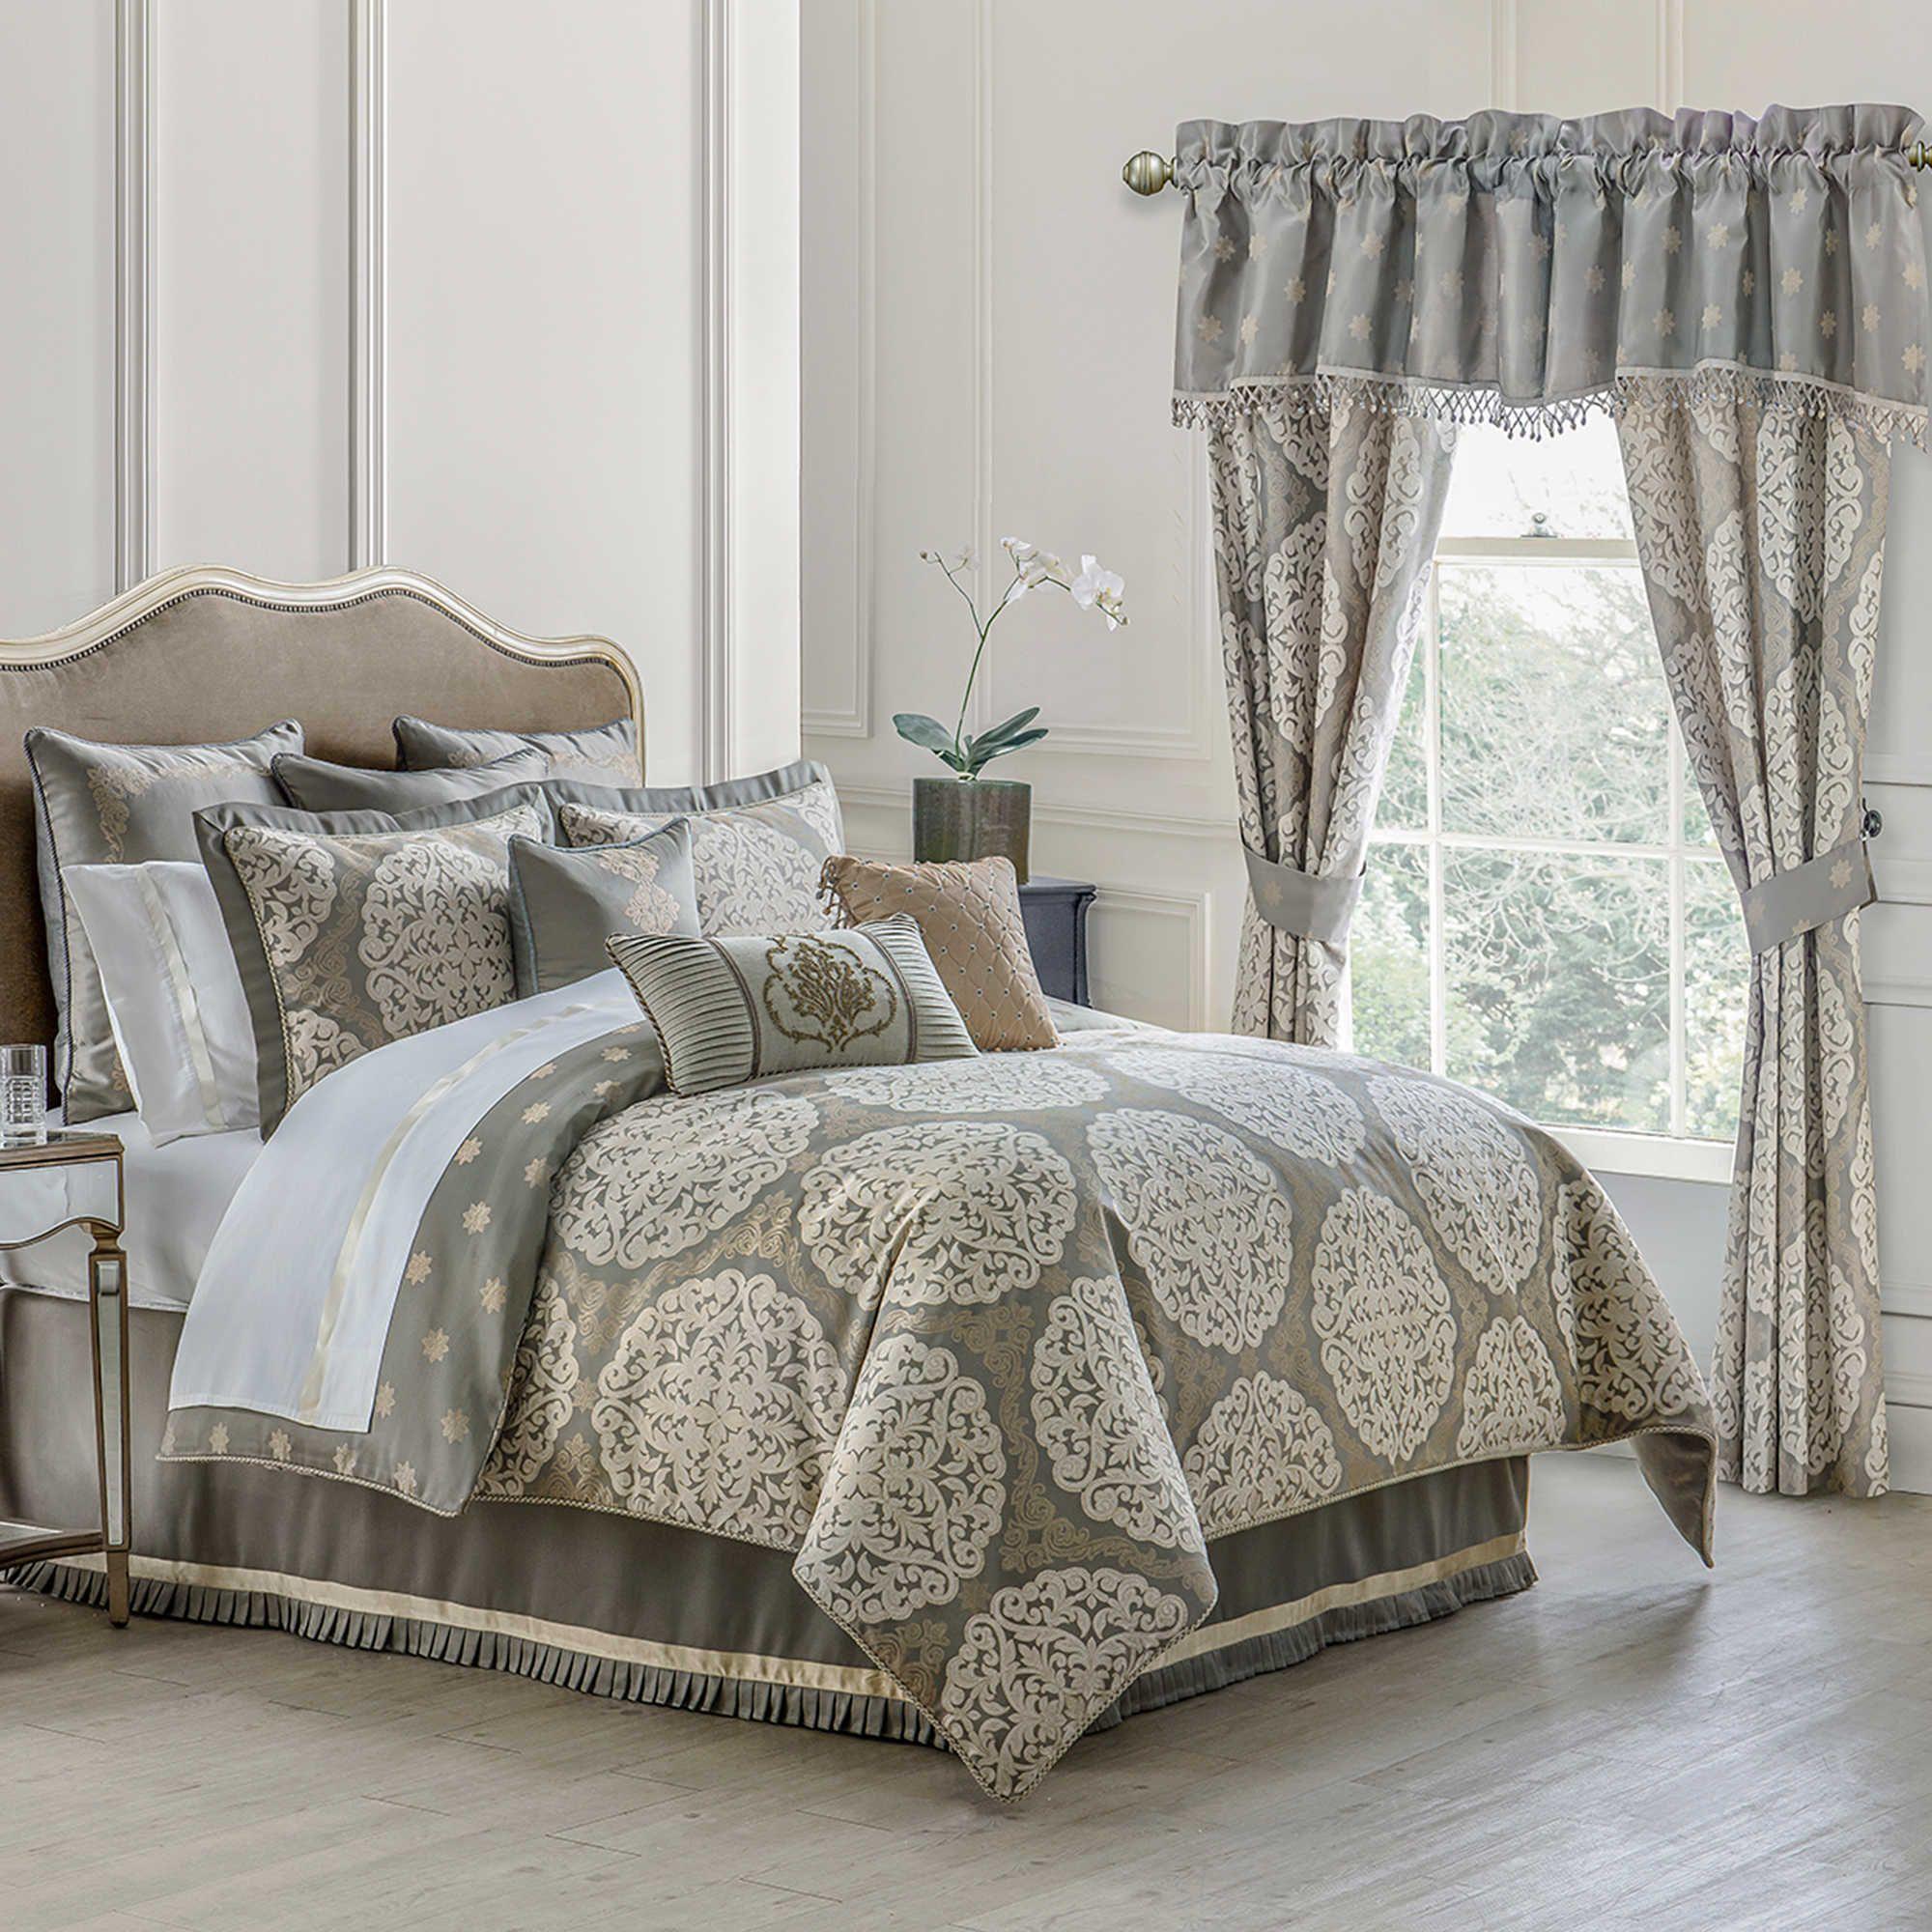 wid marquis hadley bedding coordinates waterford prod comforter set by avonleigh designs